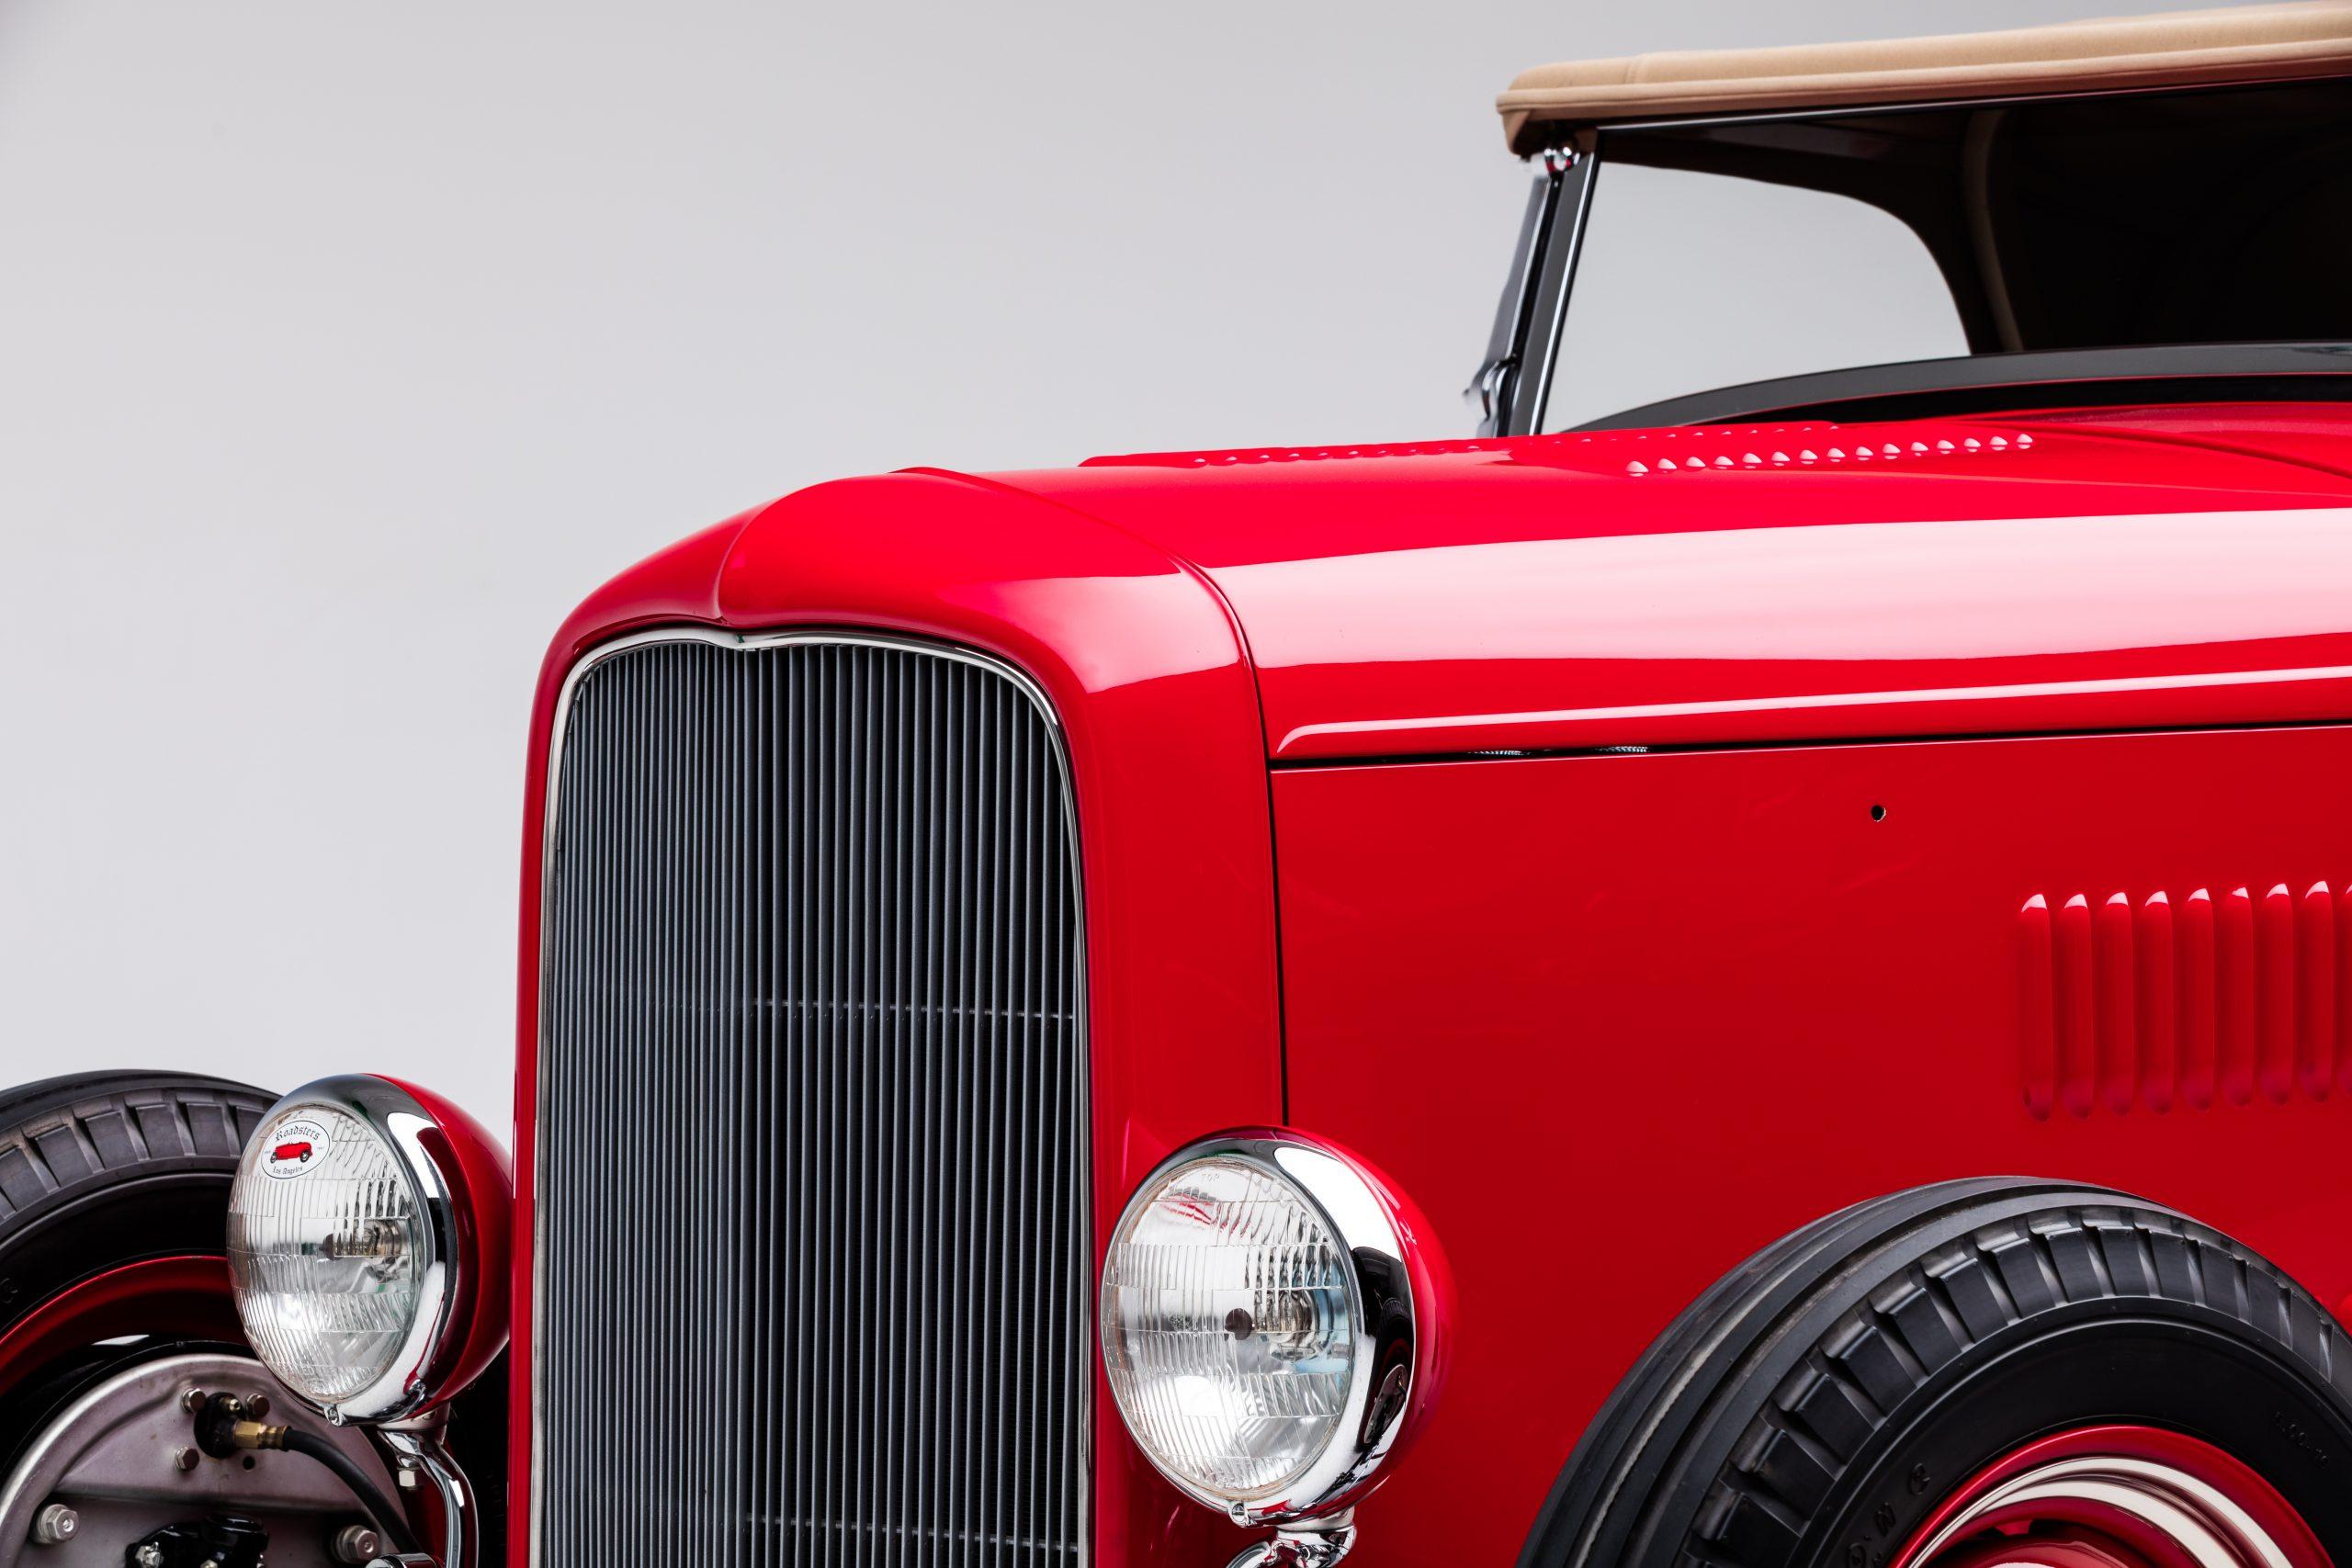 McGee Roadster - 1932 Ford - HVA - Studio 3 grille